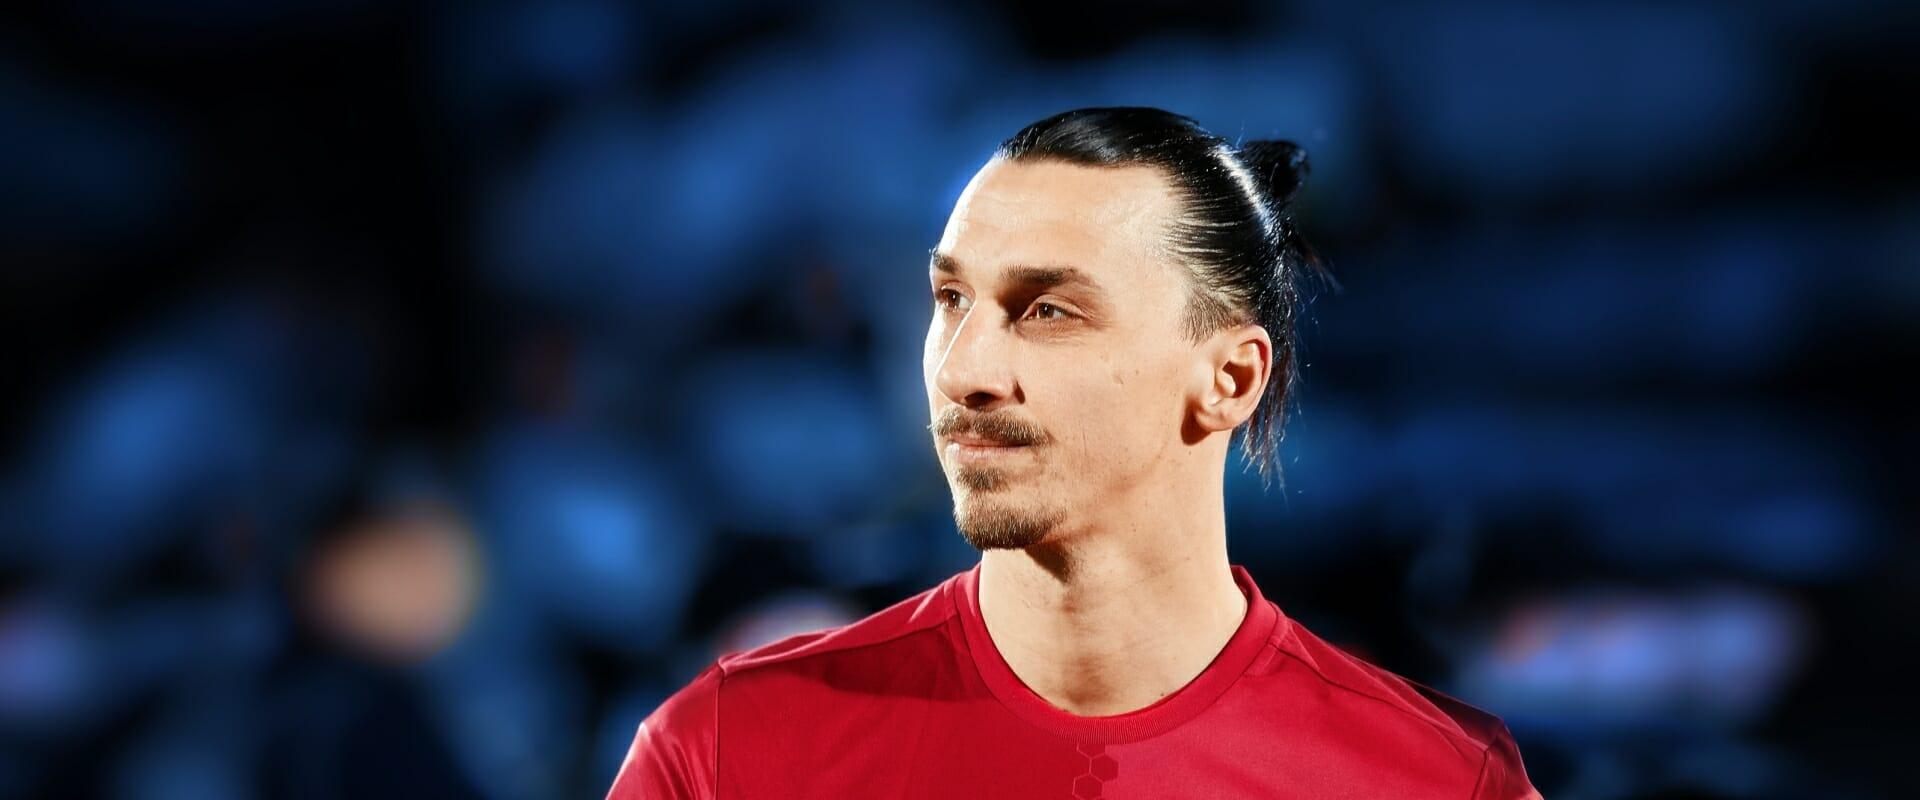 Zlatan Ibrahimovic, Sport Influencer per eccellenza